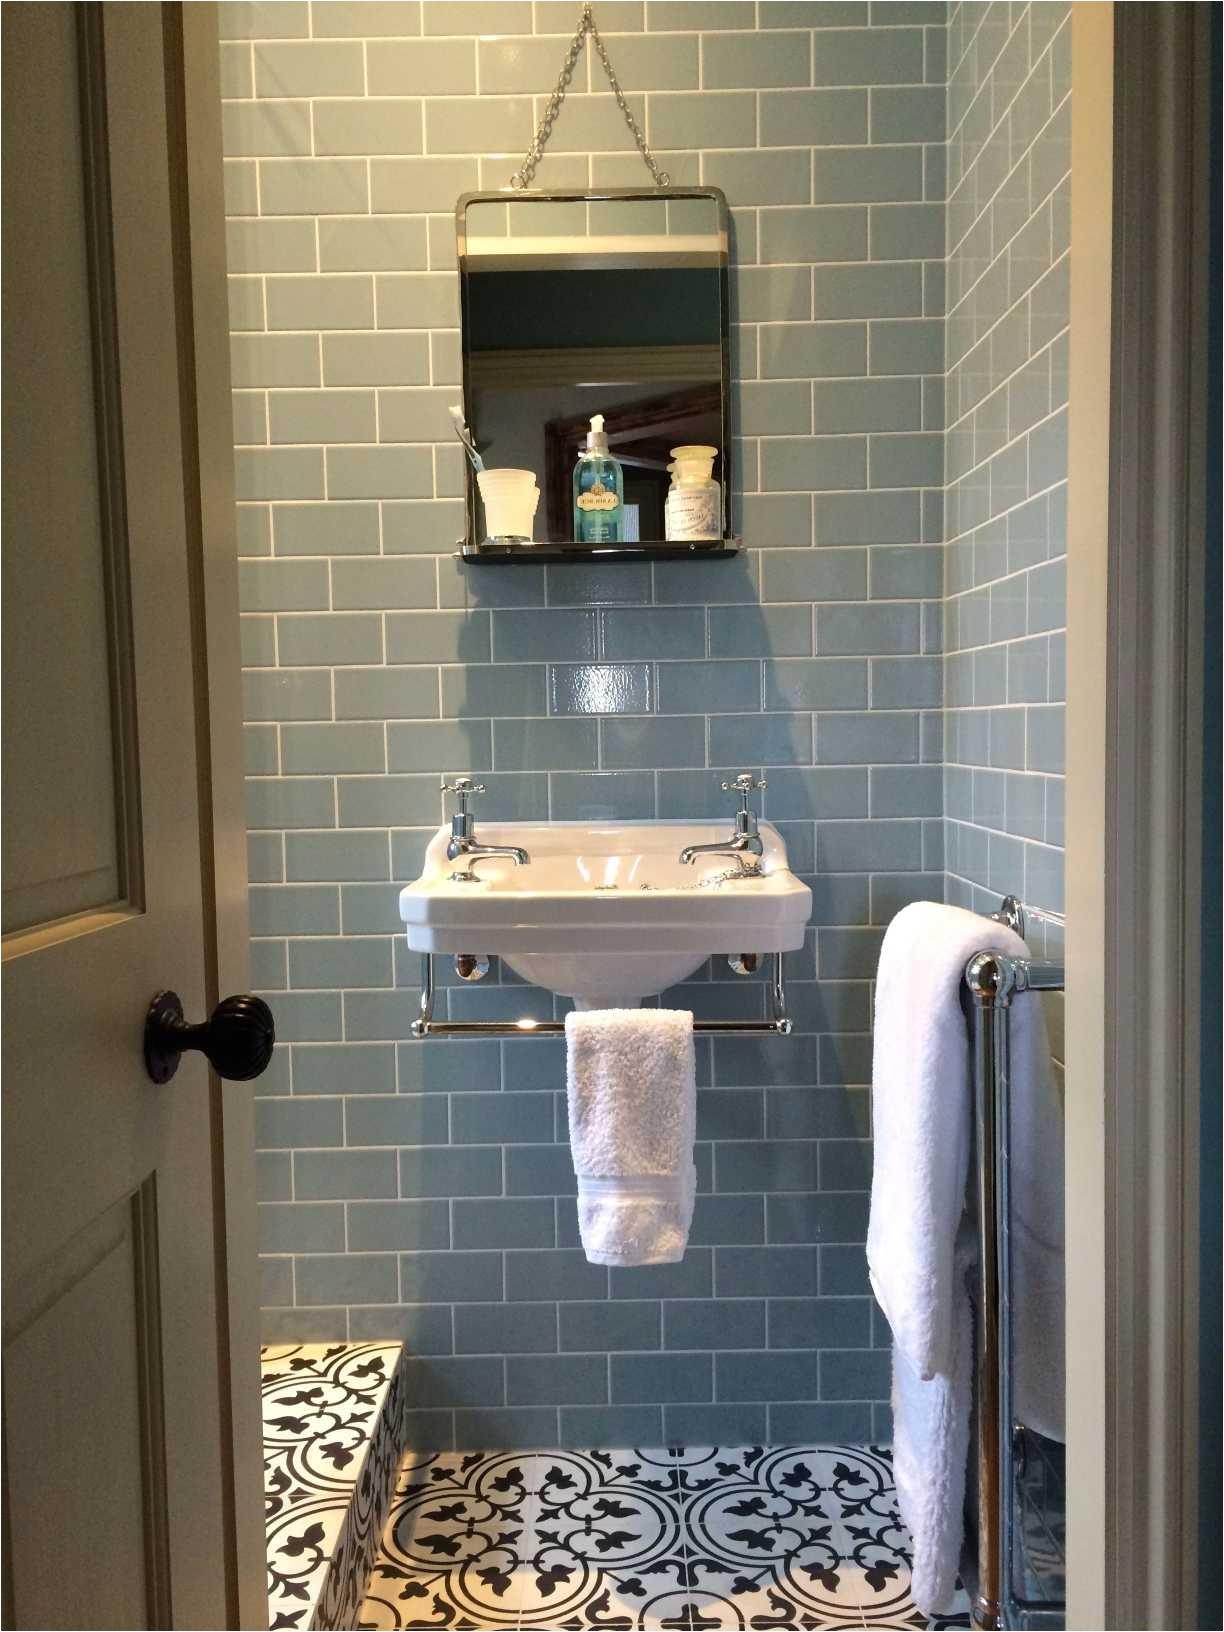 fresh fresh bathroom picture ideas lovely tag toilet ideas 0d best inspiration cheap bathroom accessories